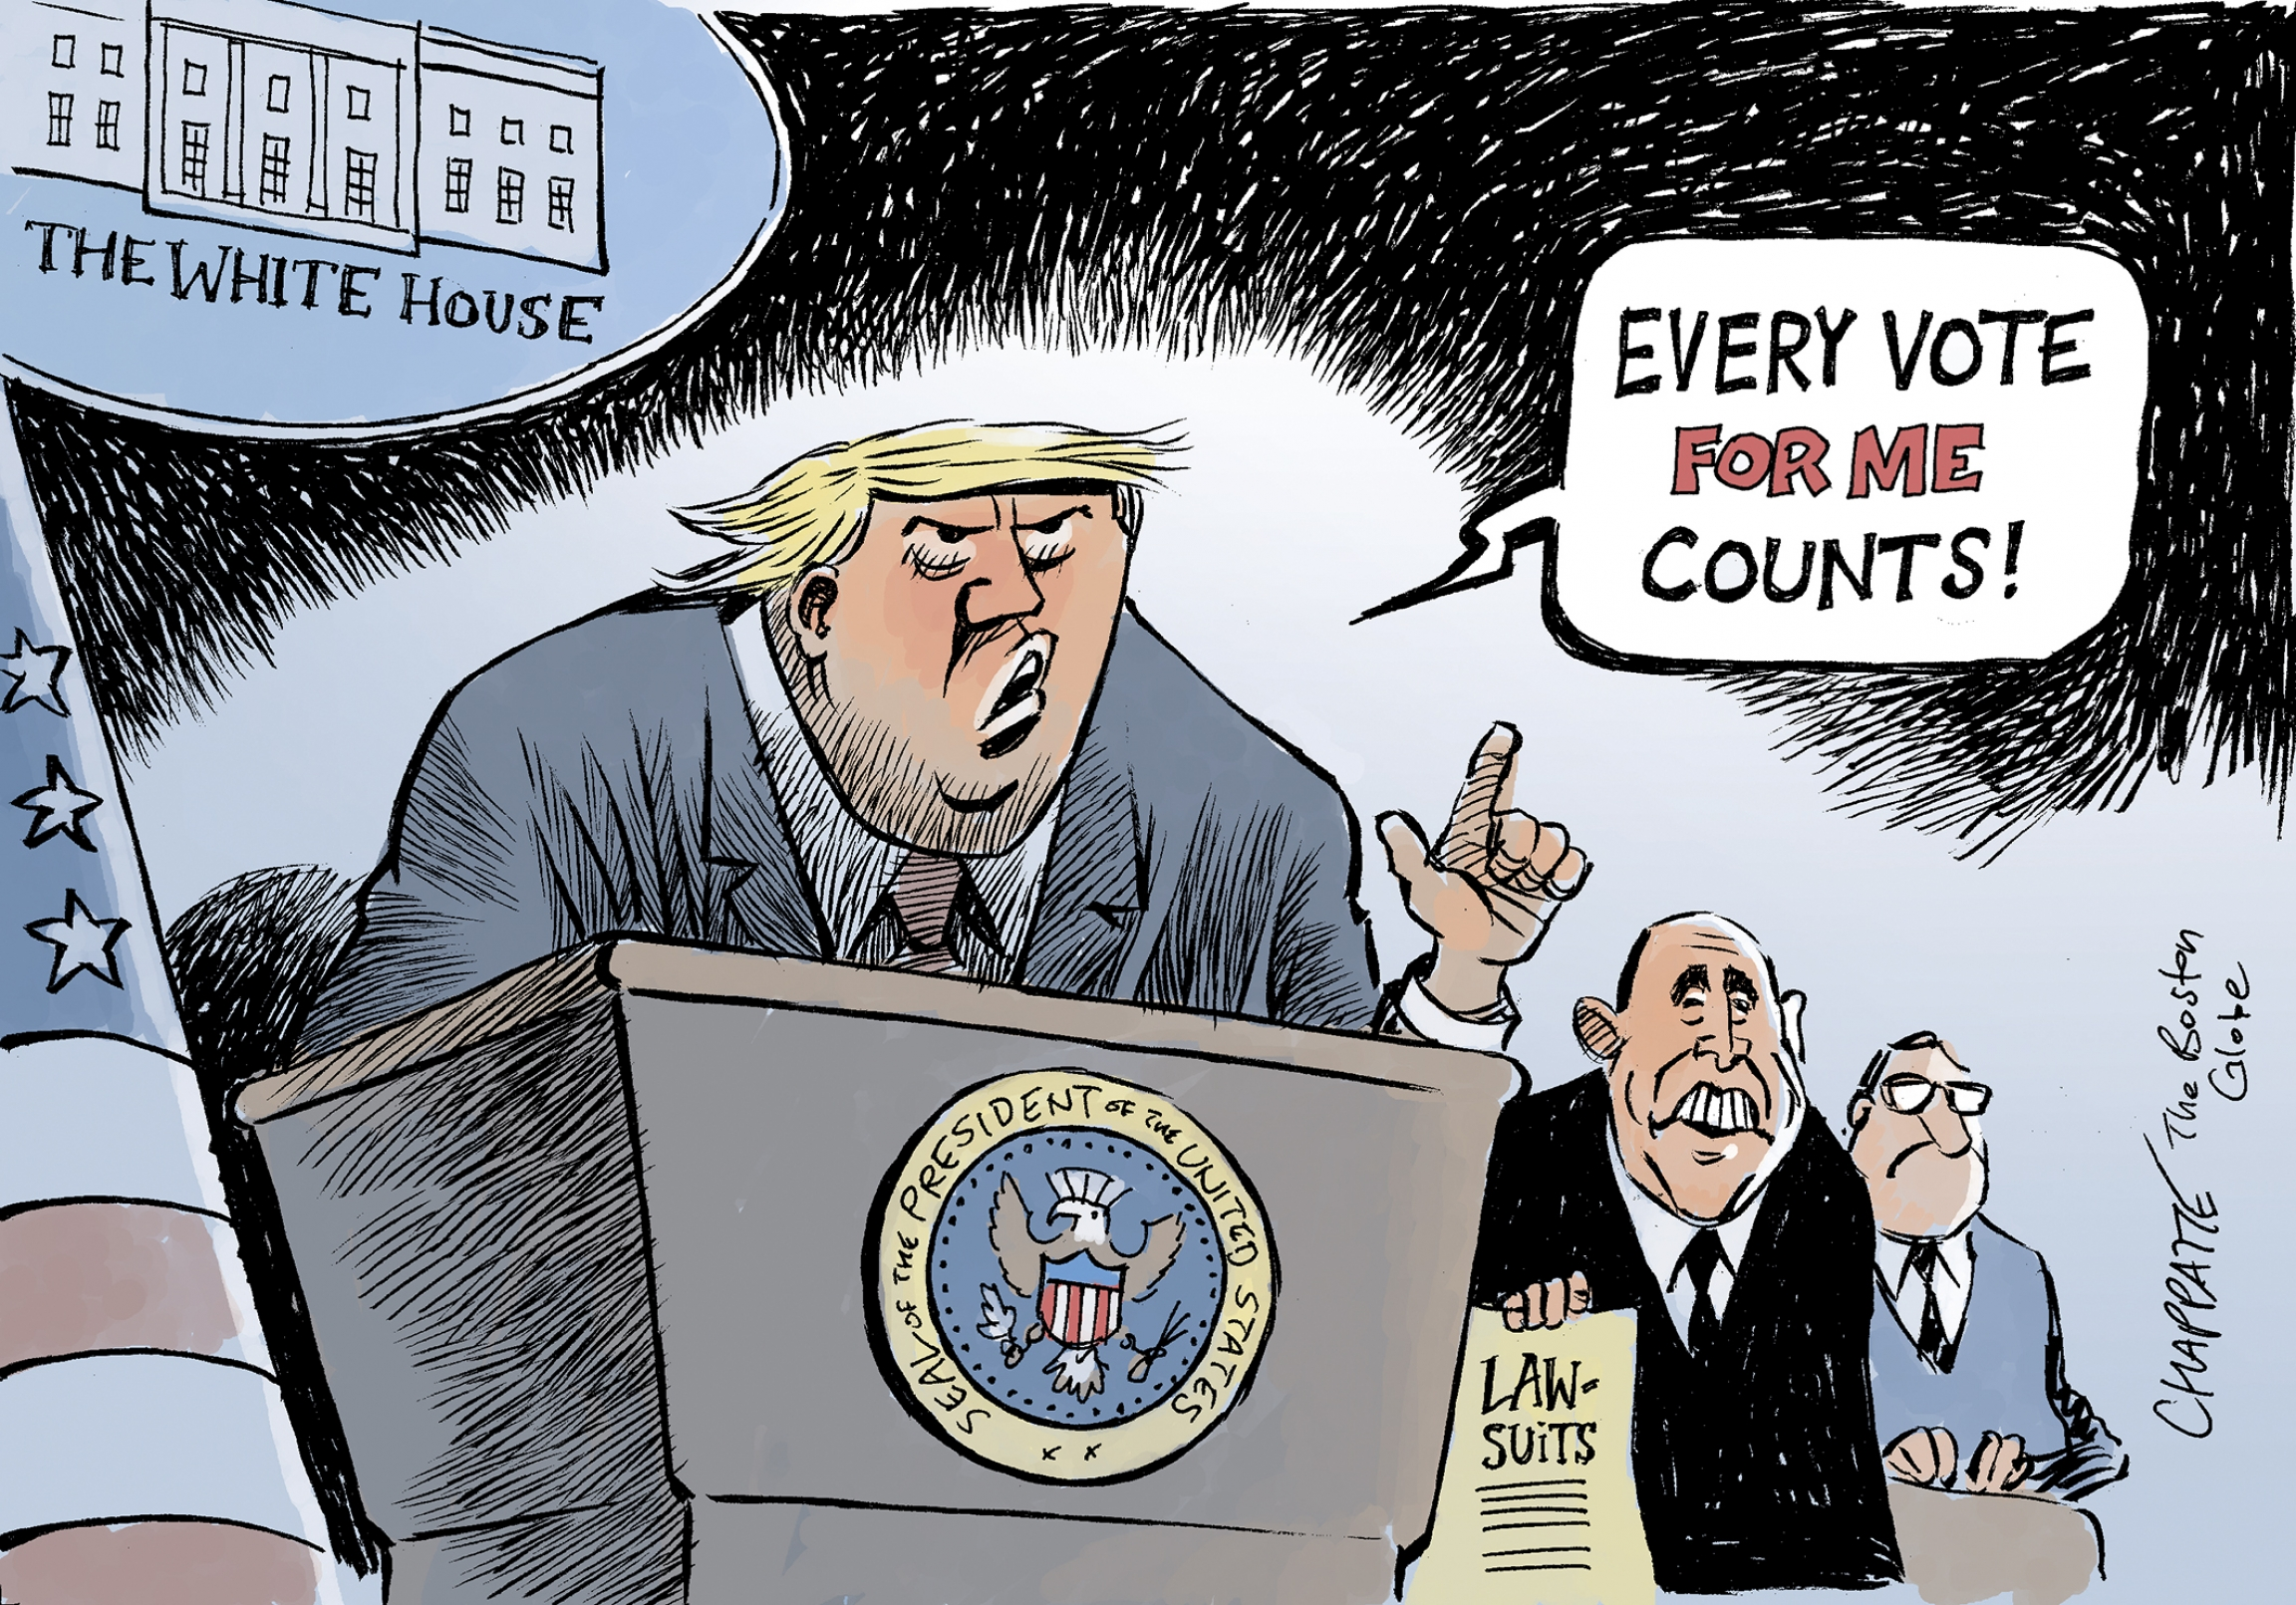 """Trump gets desperate,"" by Patrick Chappatte, Switzerland via caglecartoons.com"